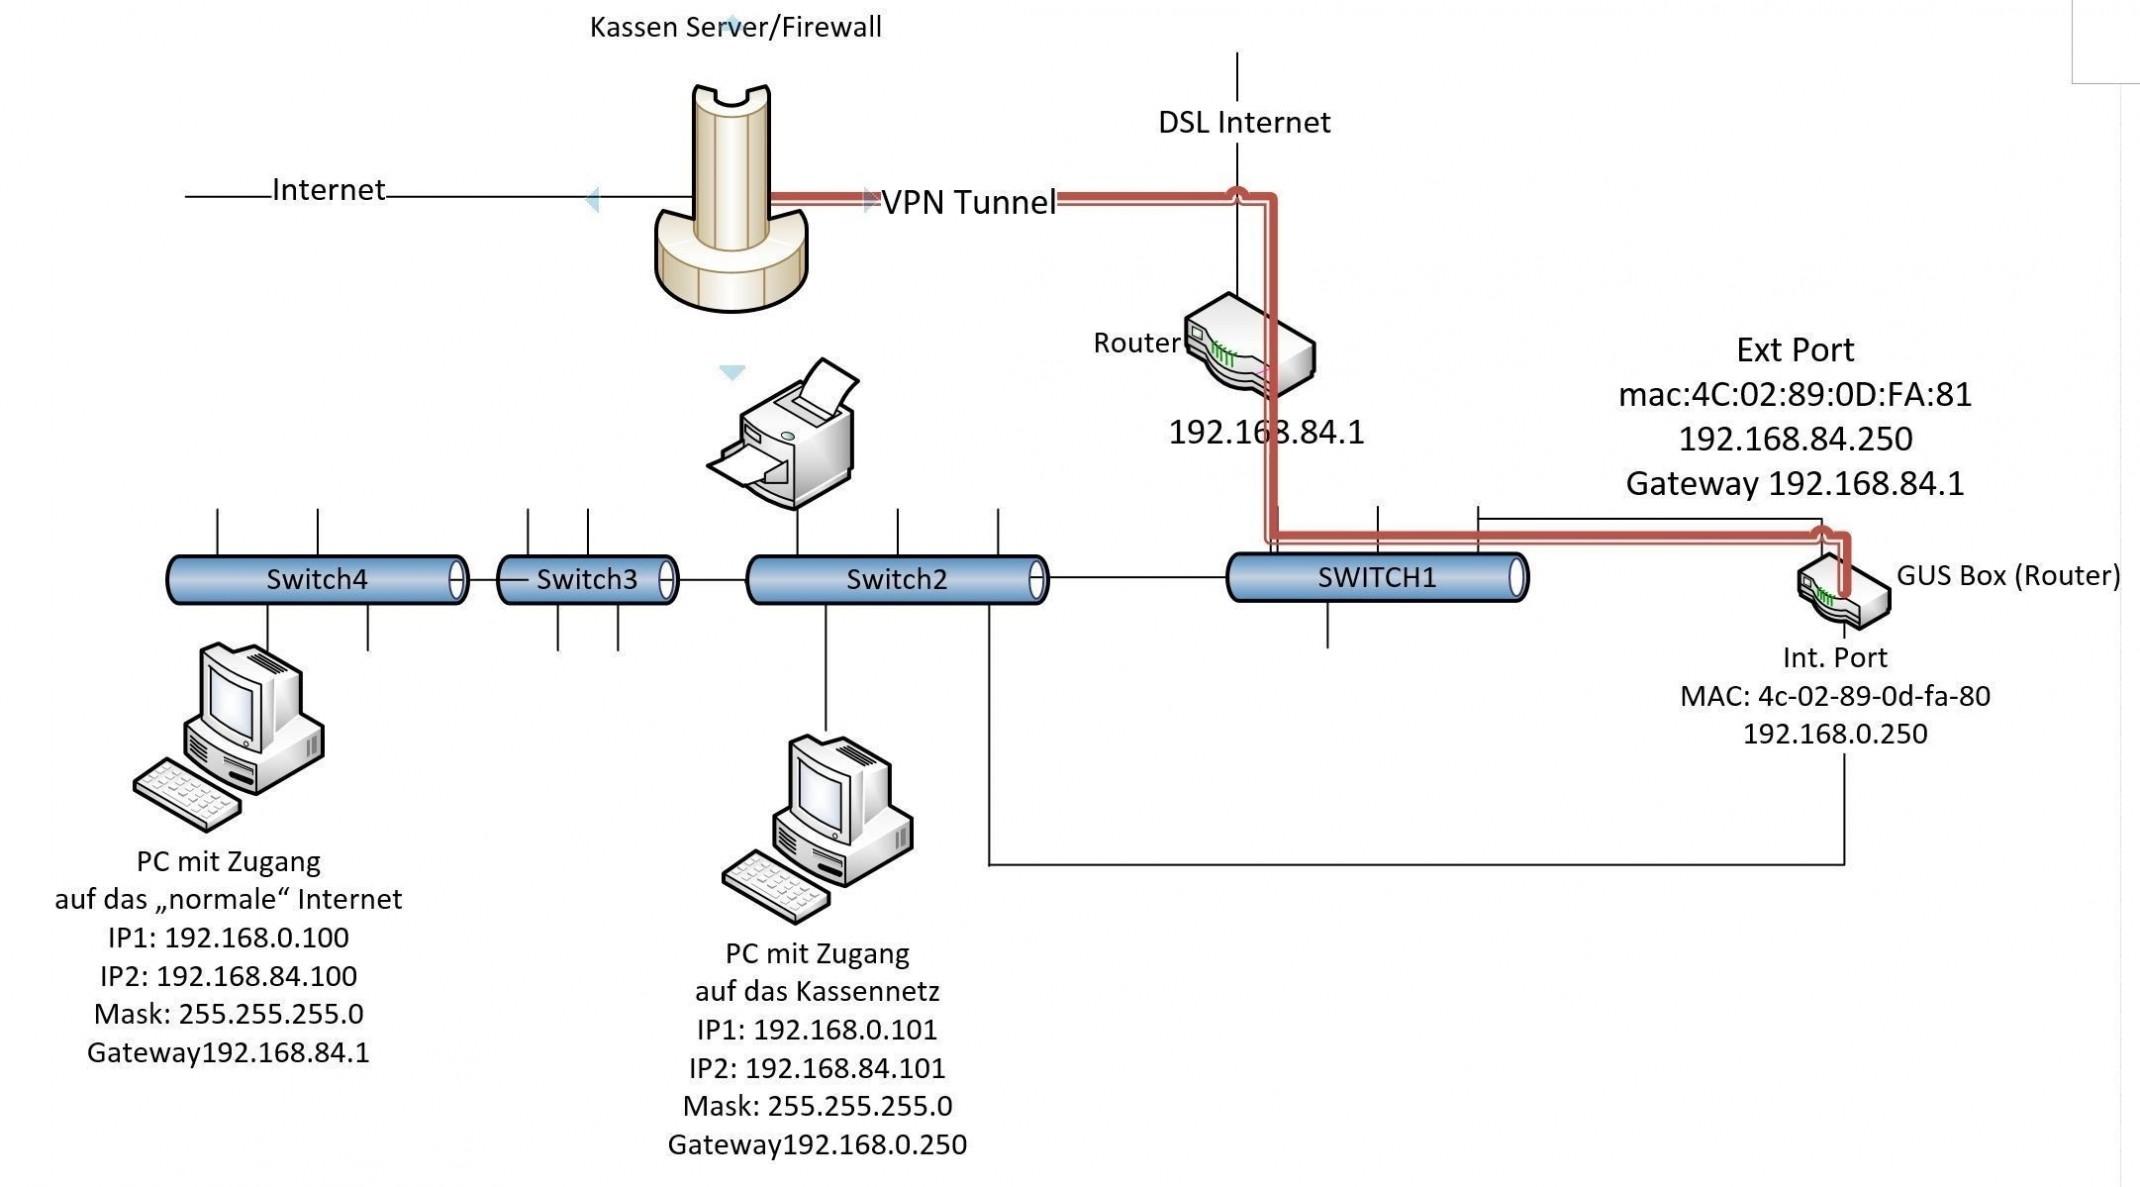 Guitar Wiring Diagram Coil Tap & Guitar Wiring Diagram Coil Tap – Coil Wiring Diagram